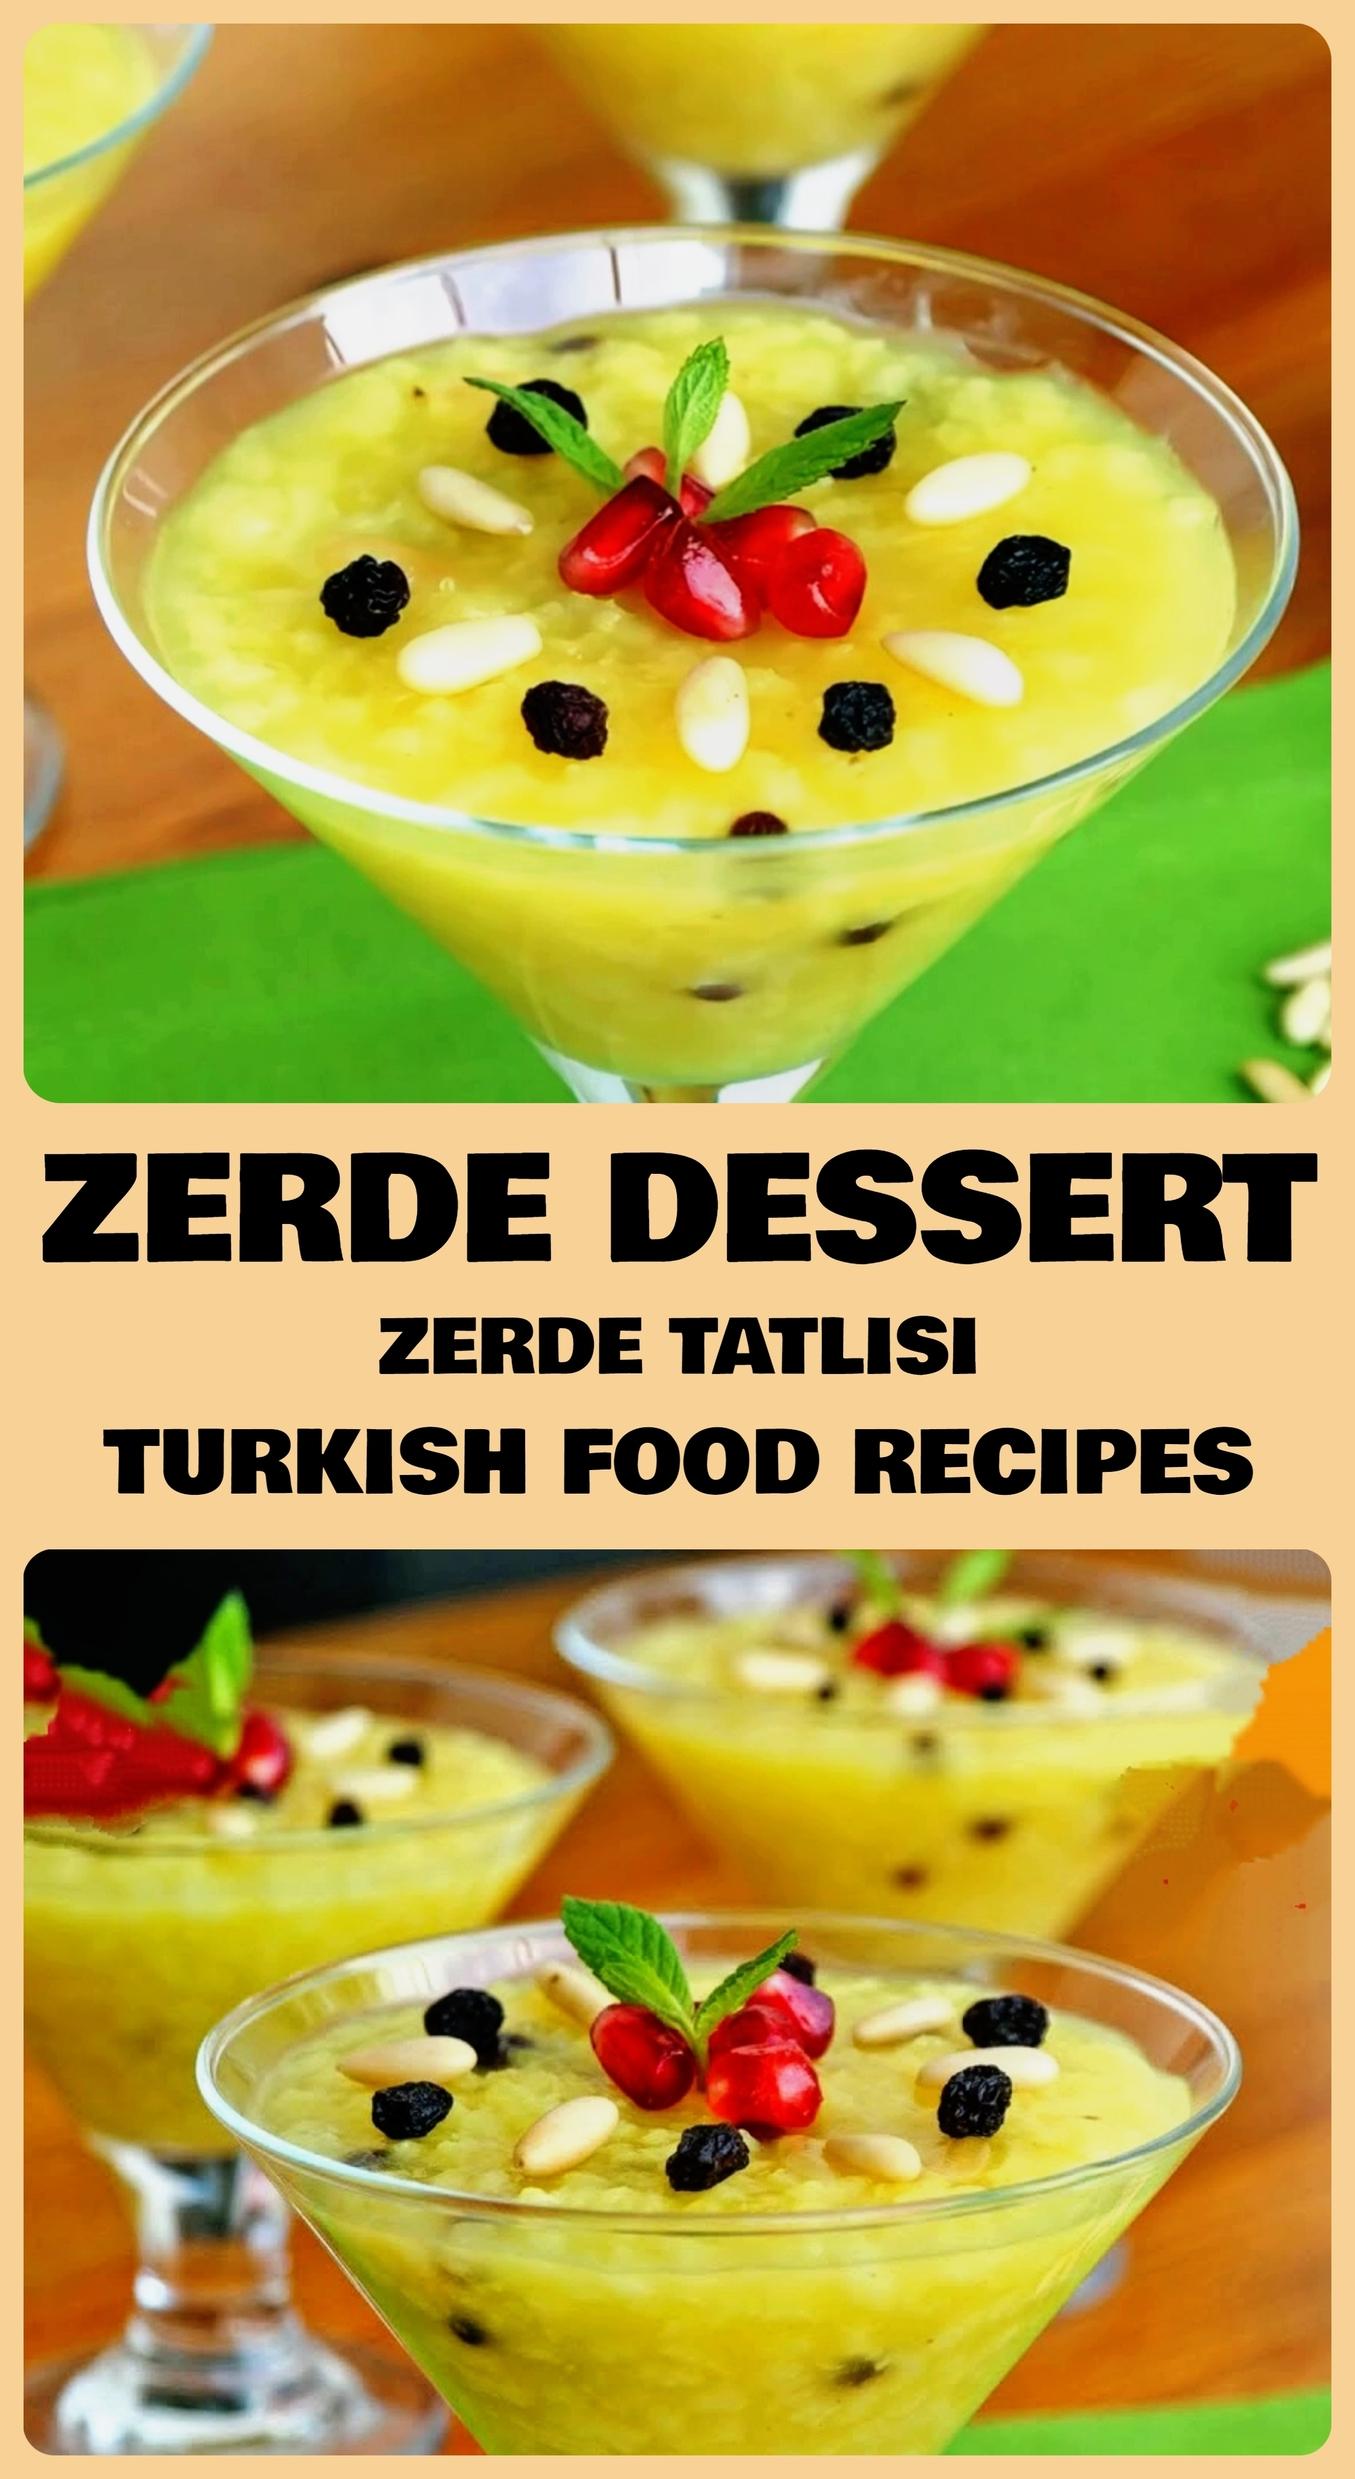 Zerde Dessert - Zerde Tatlisi Recipe